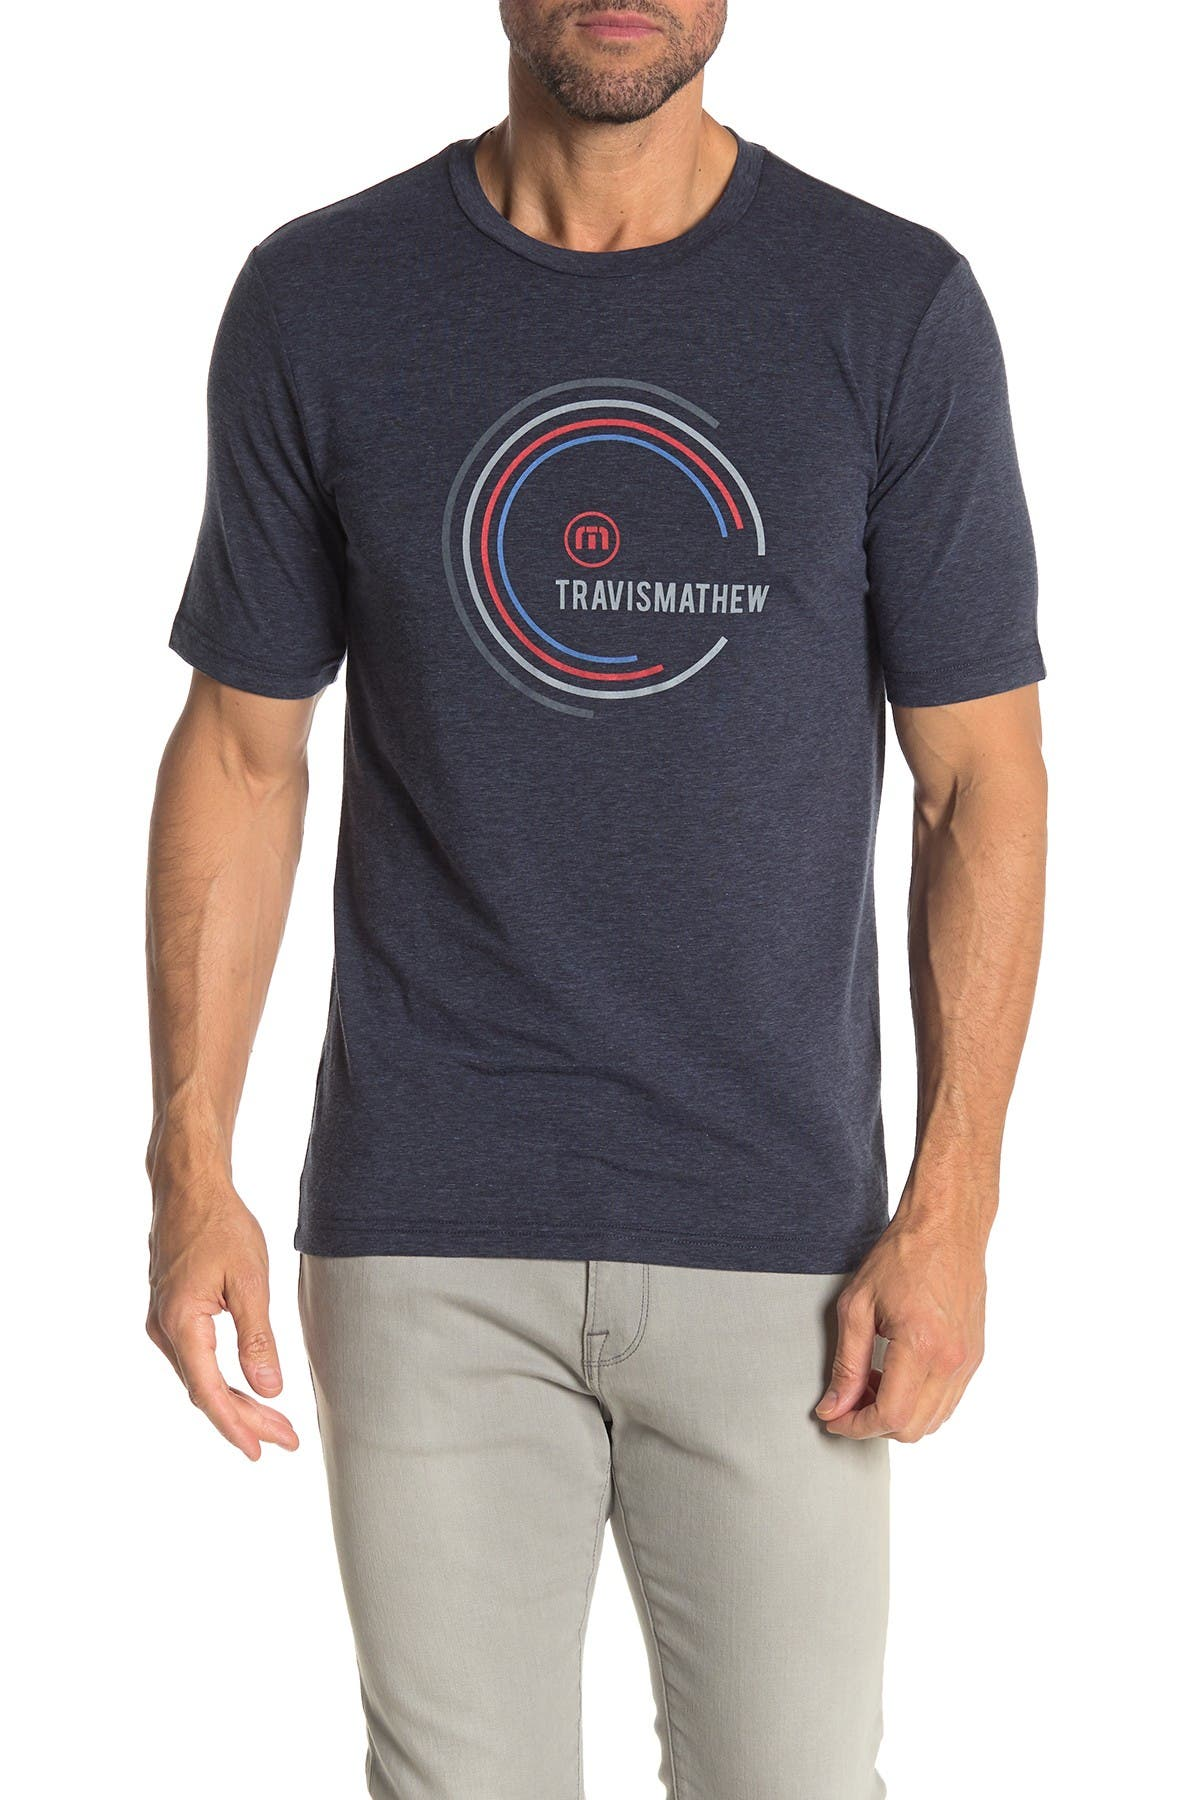 Image of TRAVIS MATHEW Breaker Graphic Print Performance T-Shirt